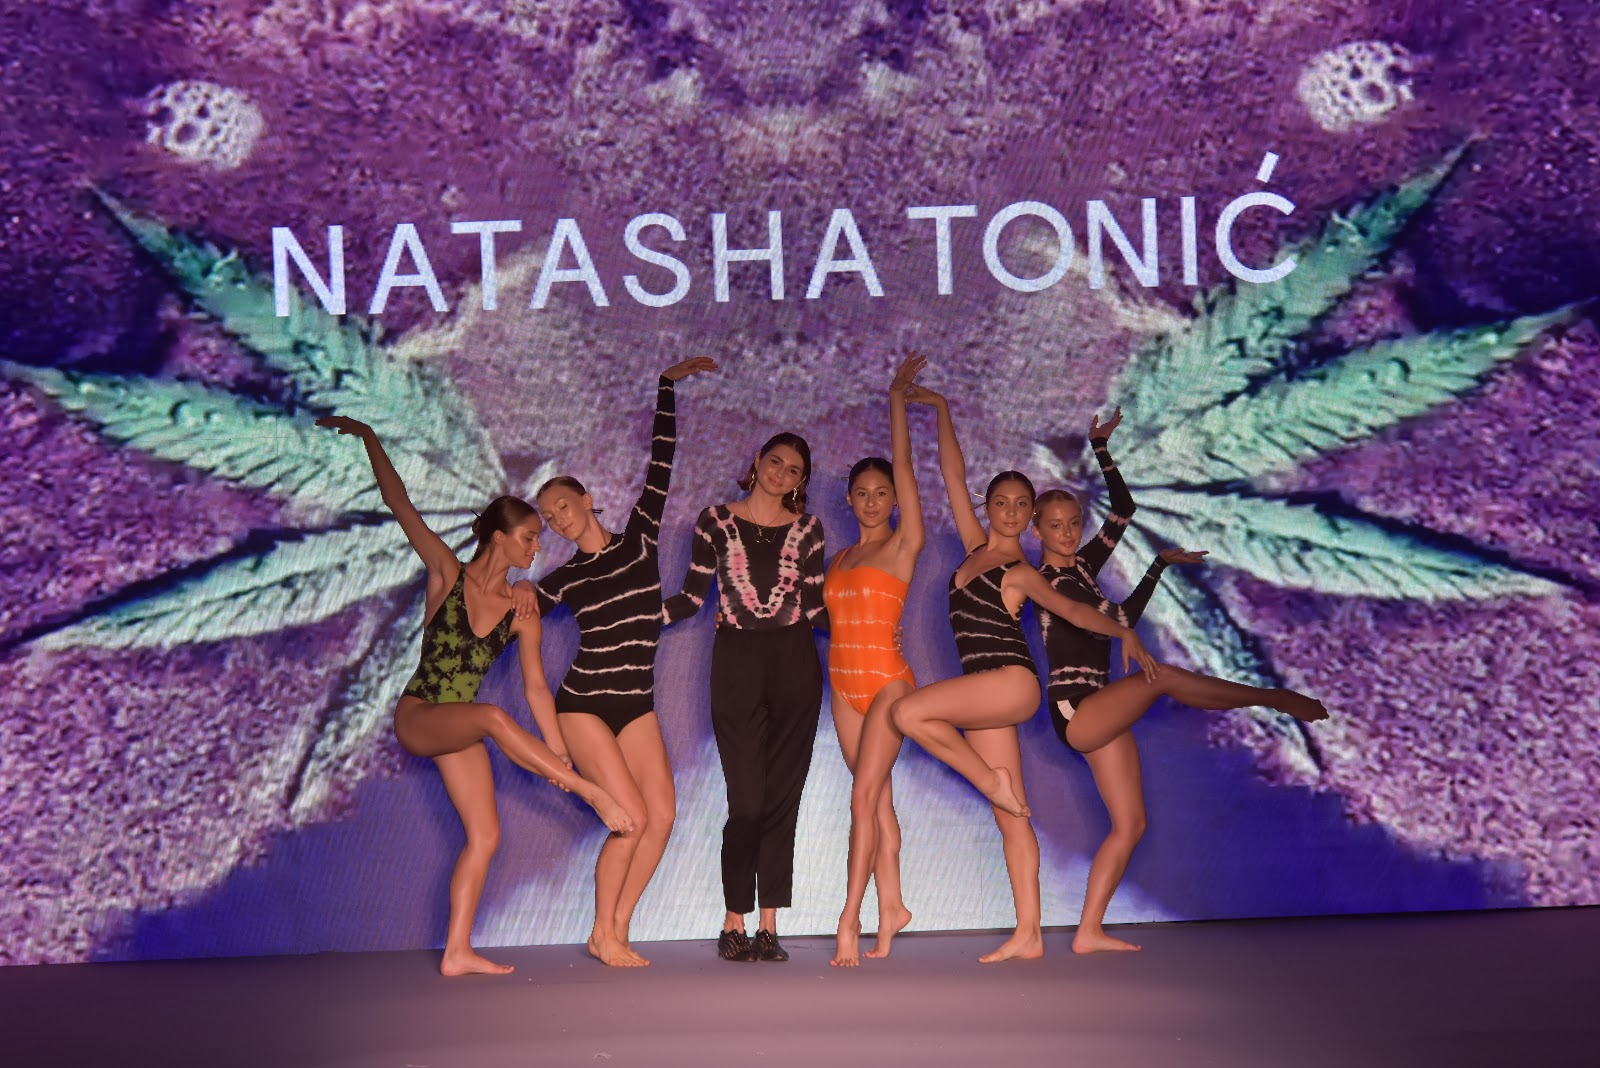 NATASHA TONIC-Miami Swimweek-paraisomb-paraiso-mariestilo-